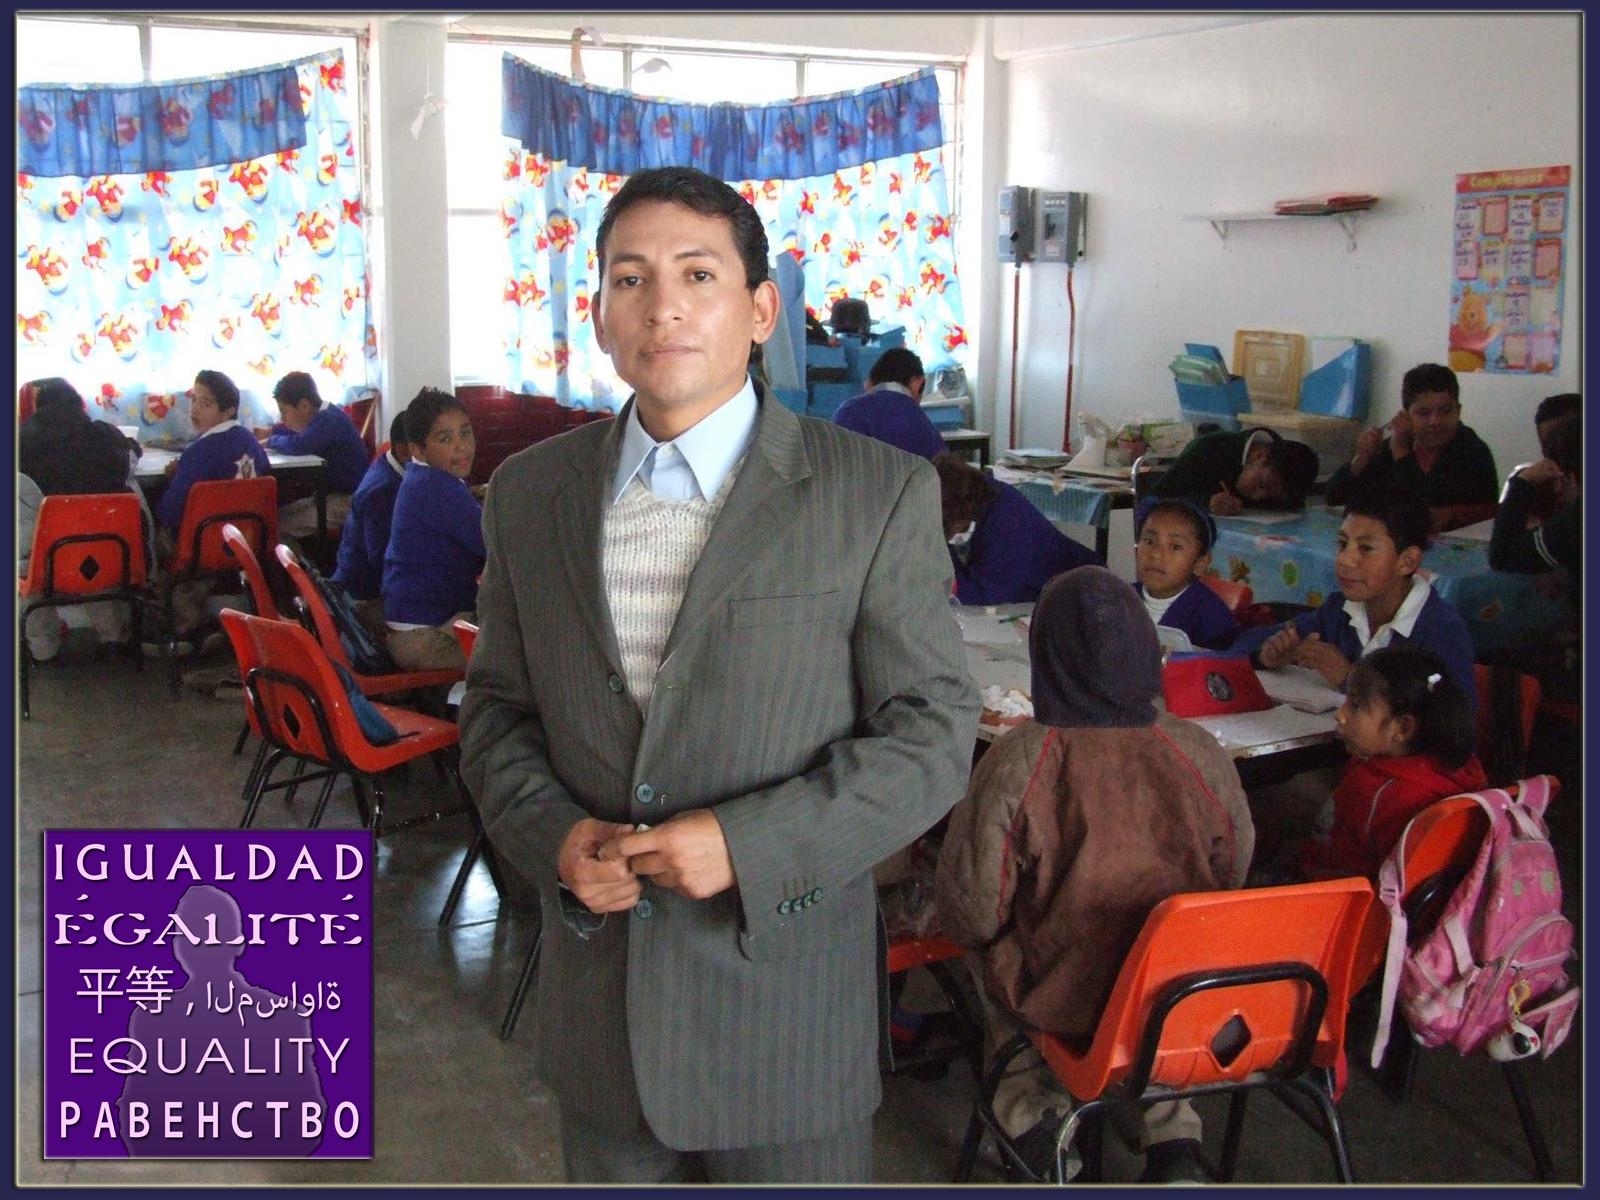 Agustín Estrada Negrete